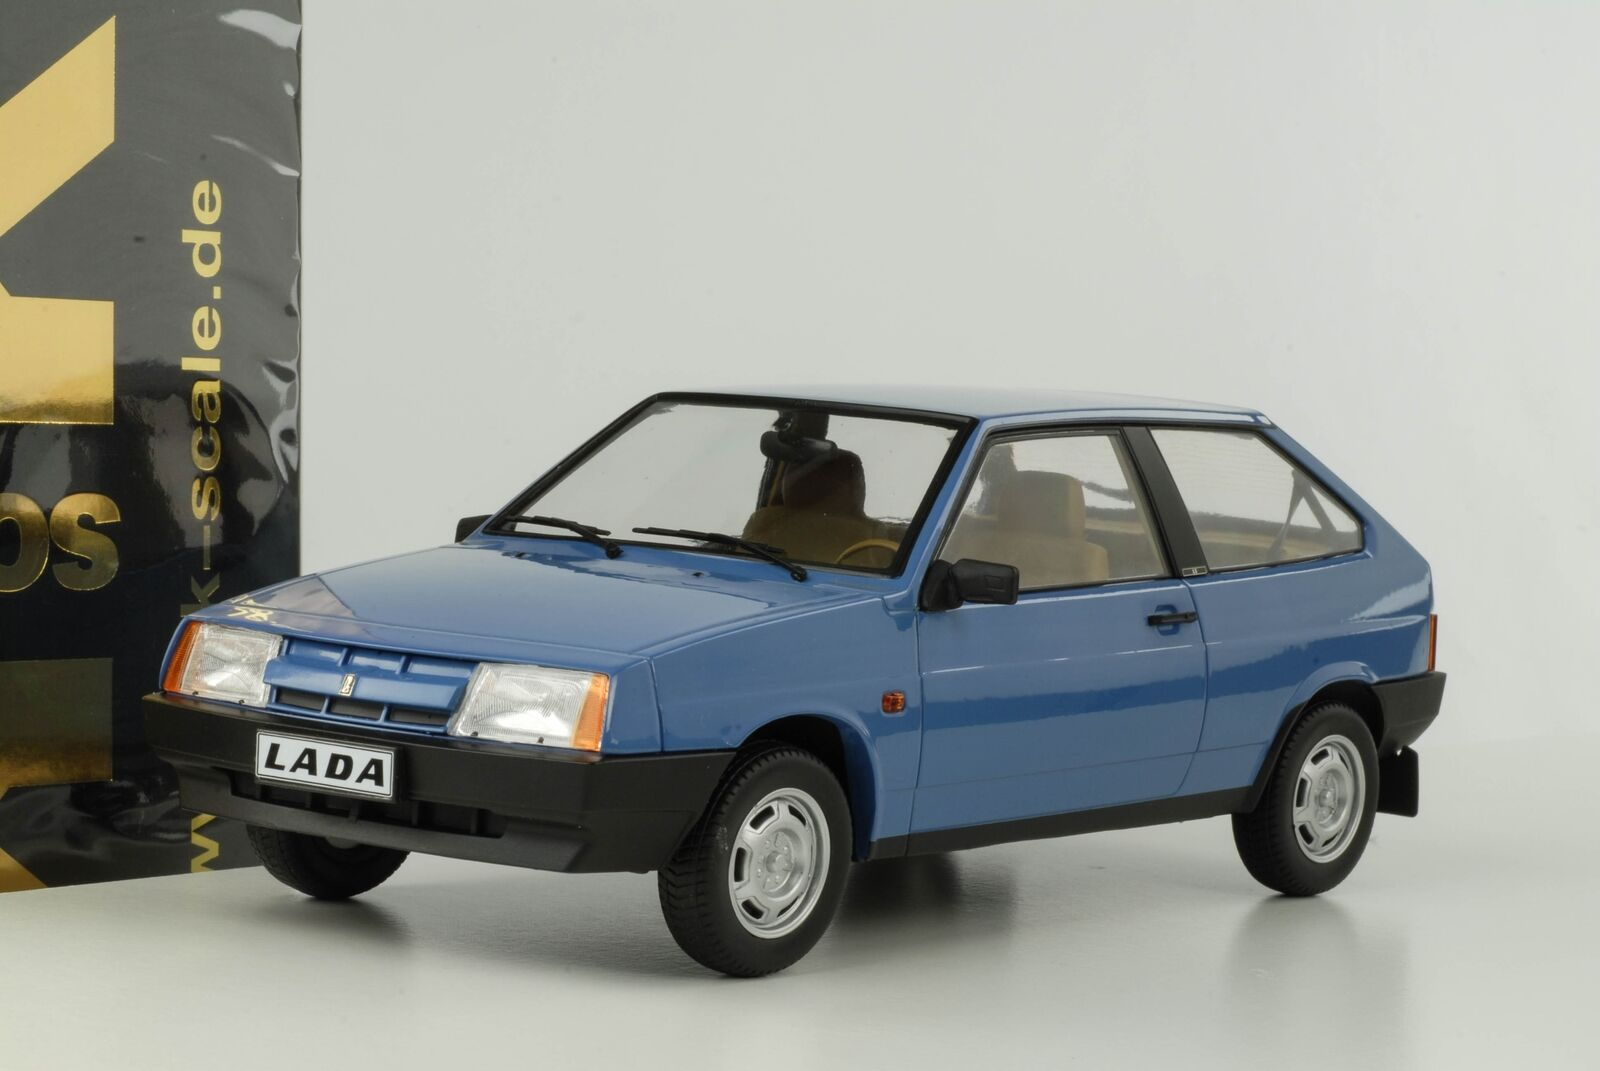 Lada Samara VAZ 1984 blue 1 18 18 18 KK diecast N af6e82